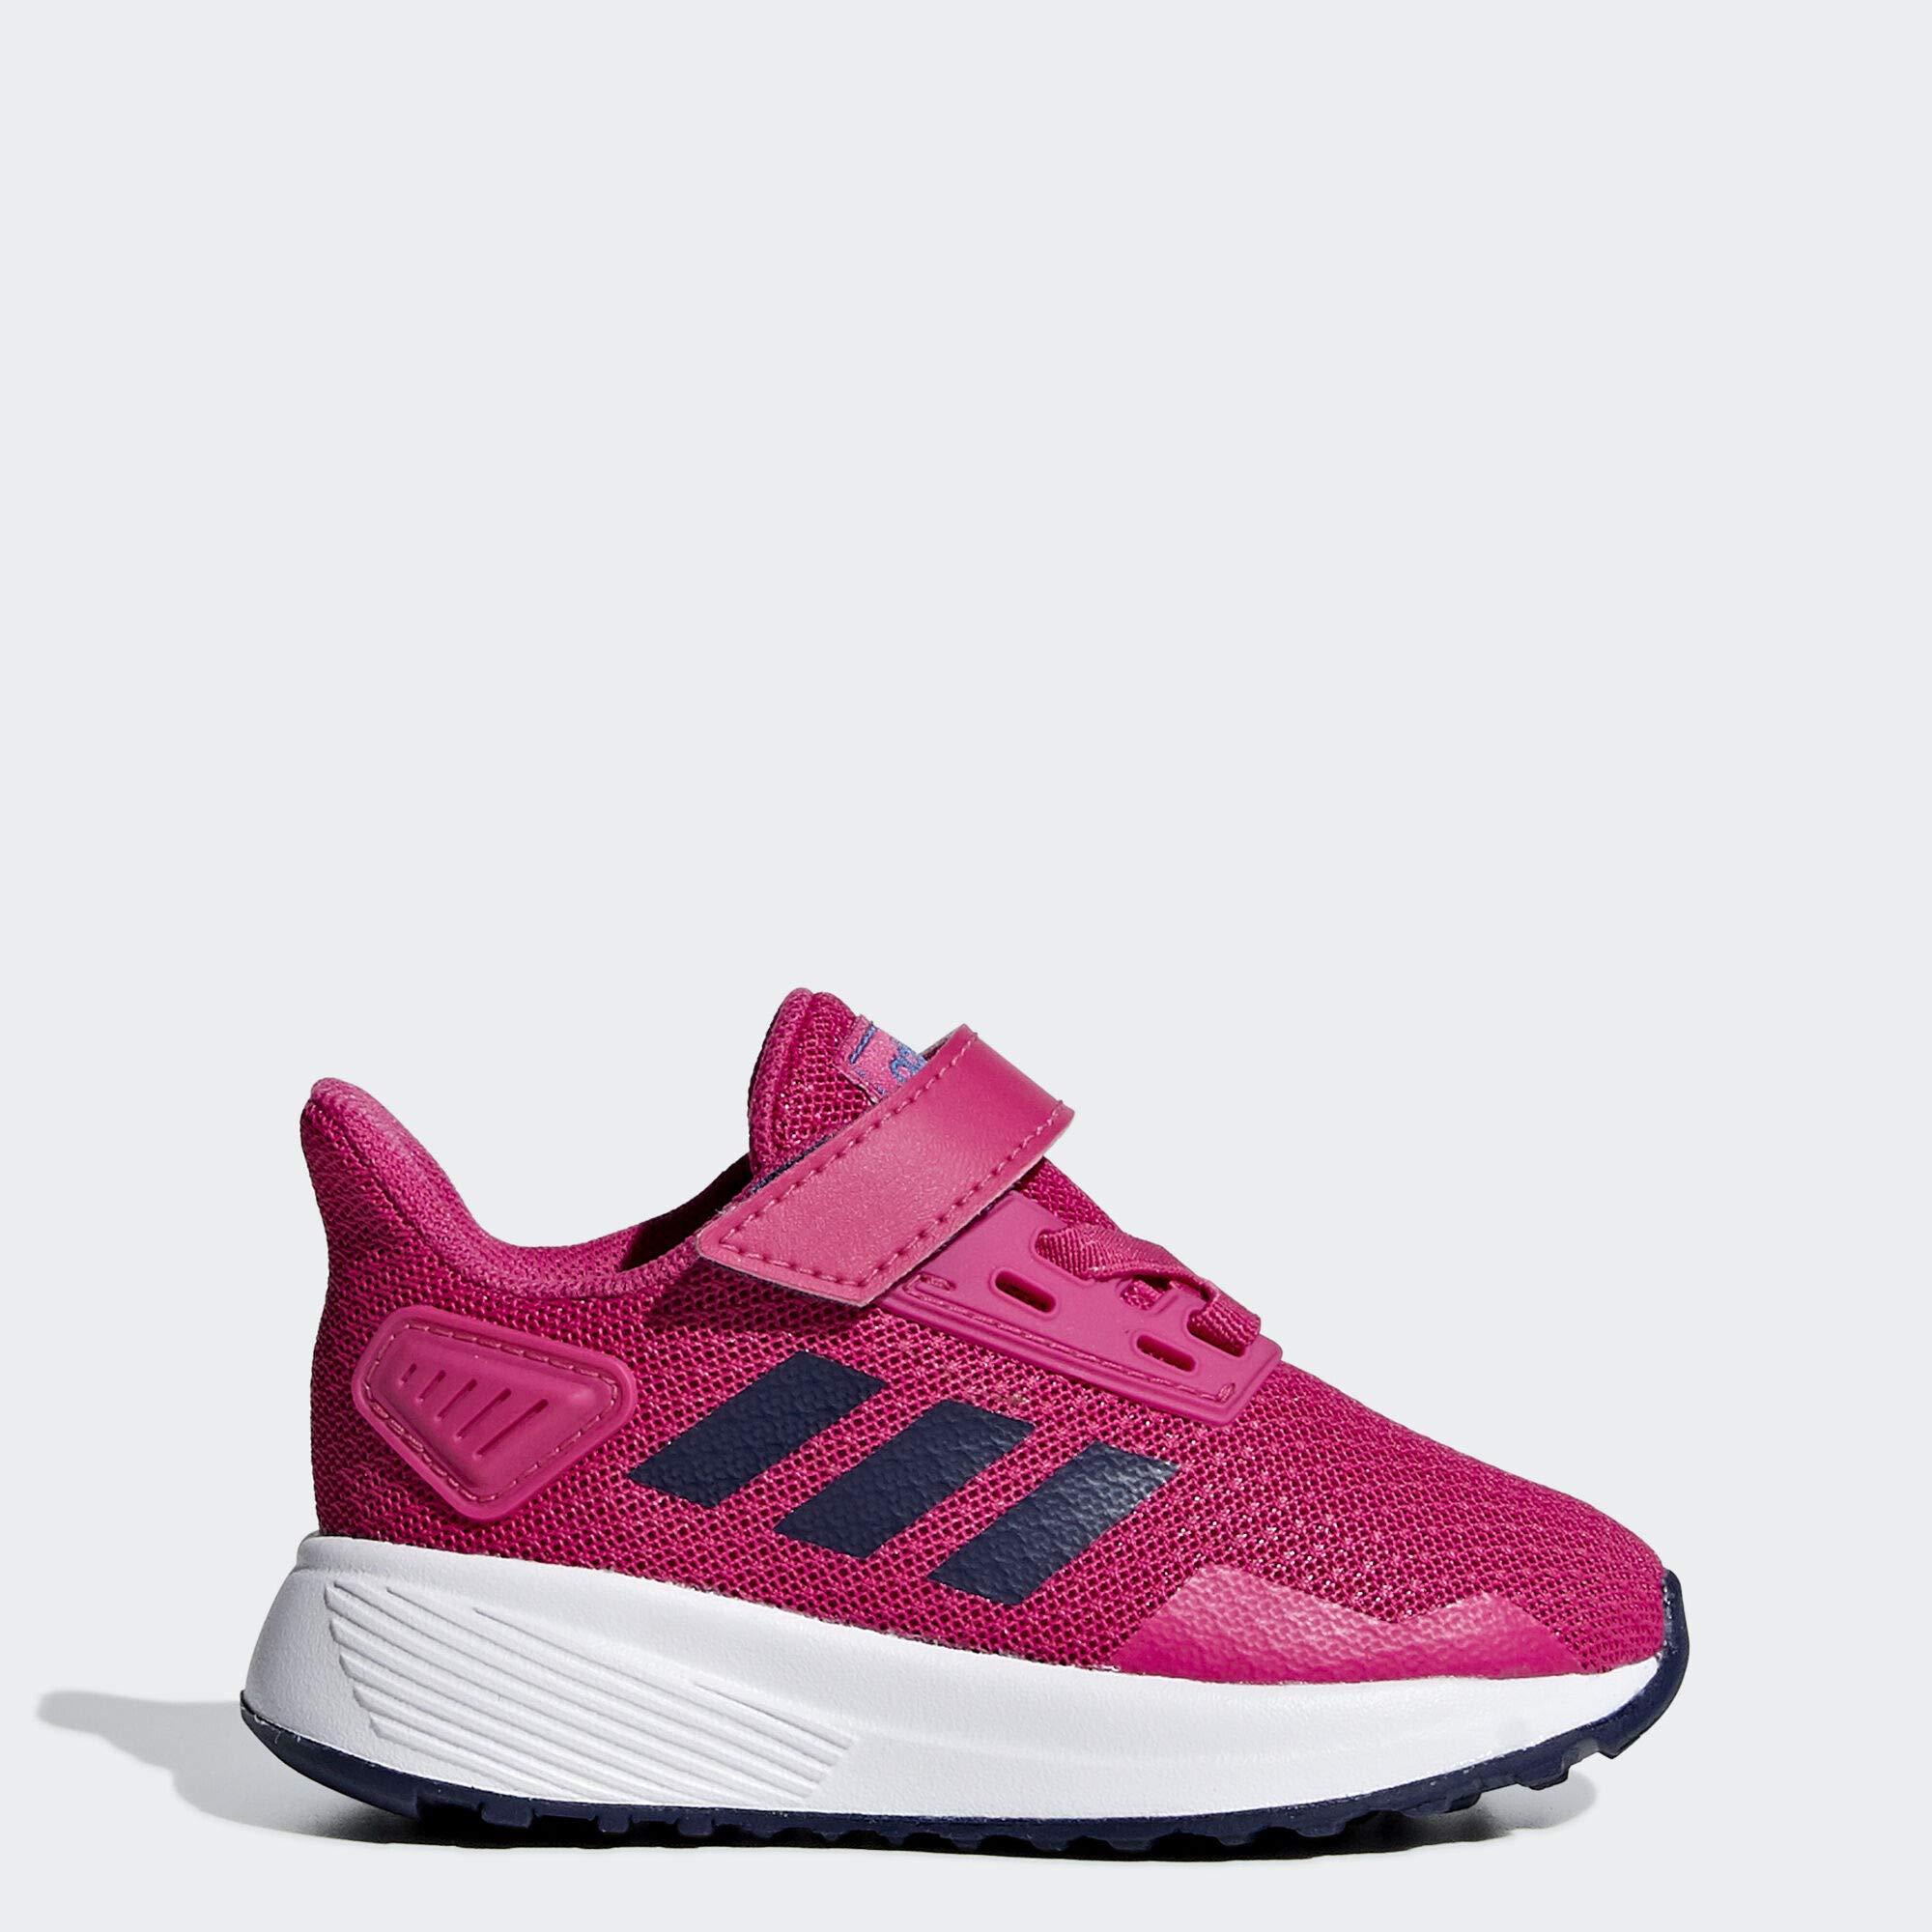 adidas Baby Duramo 9 Shoes, White/Real Magenta/Dark Blue, 9K M US Toddler by adidas